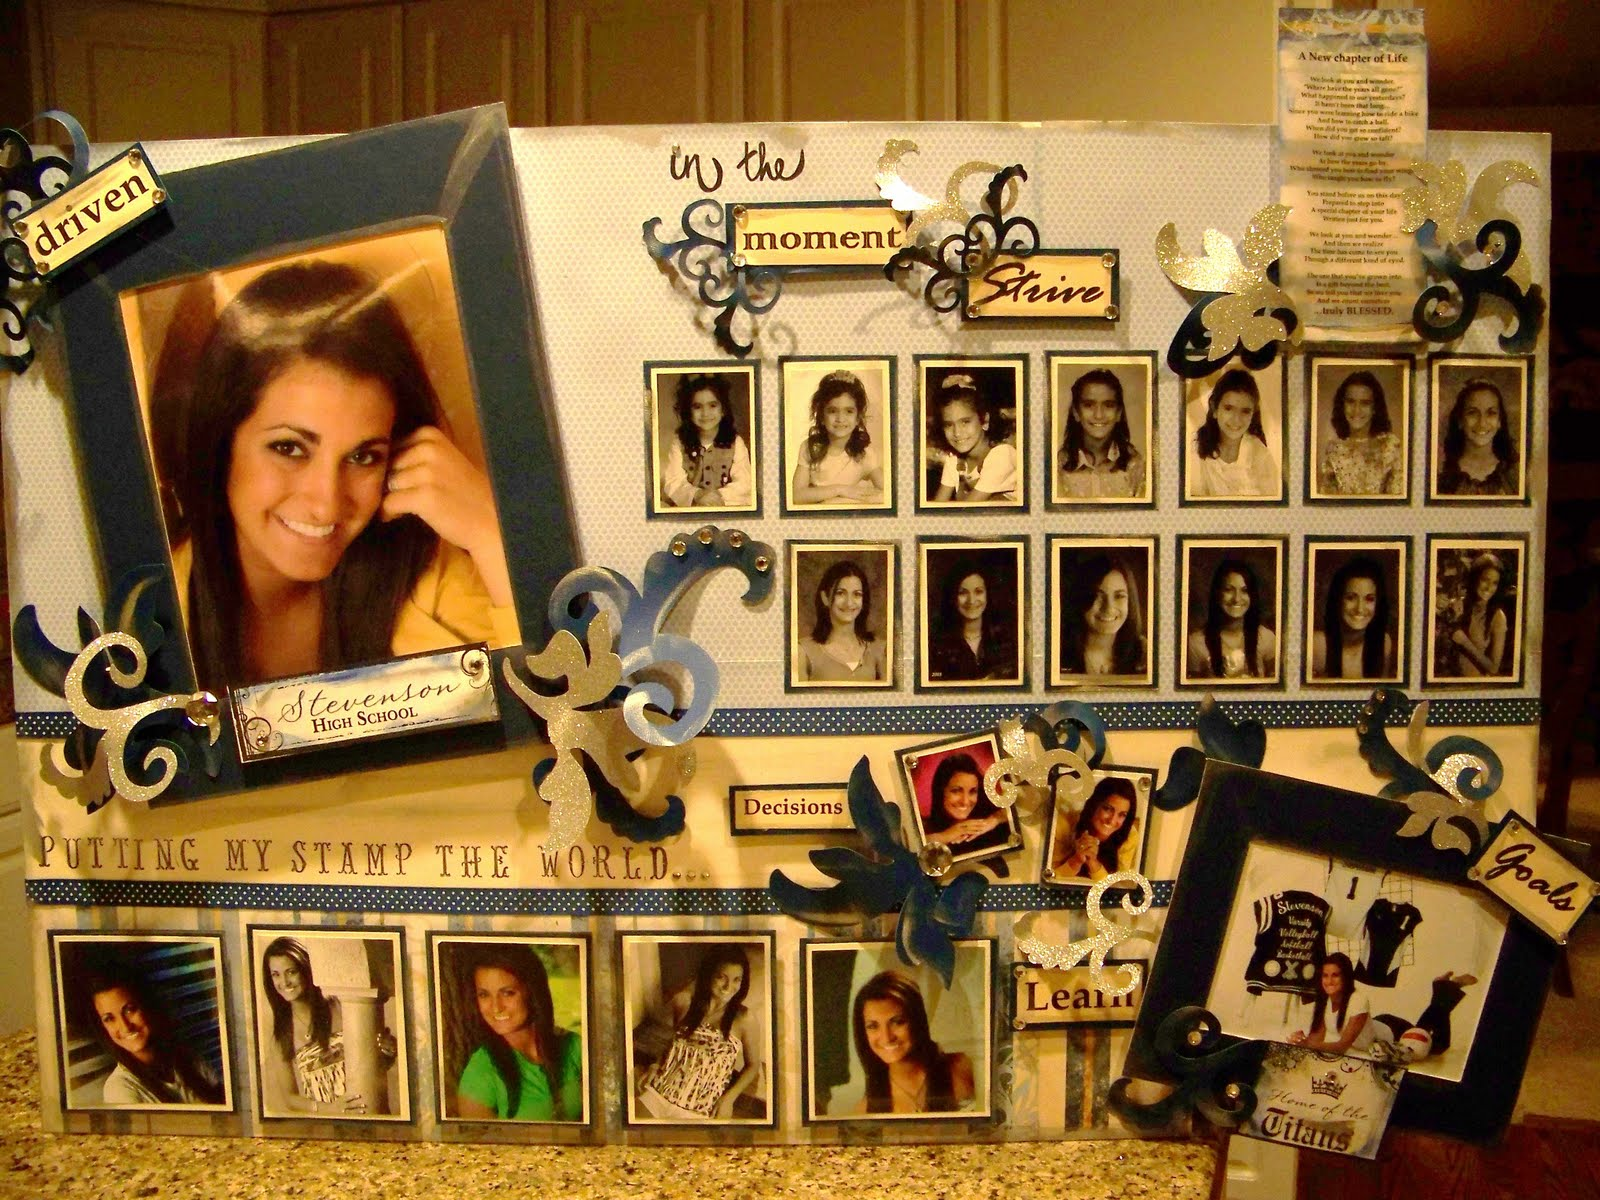 Graduation Announcements Invitations Shutterfly Graduation photo display boards